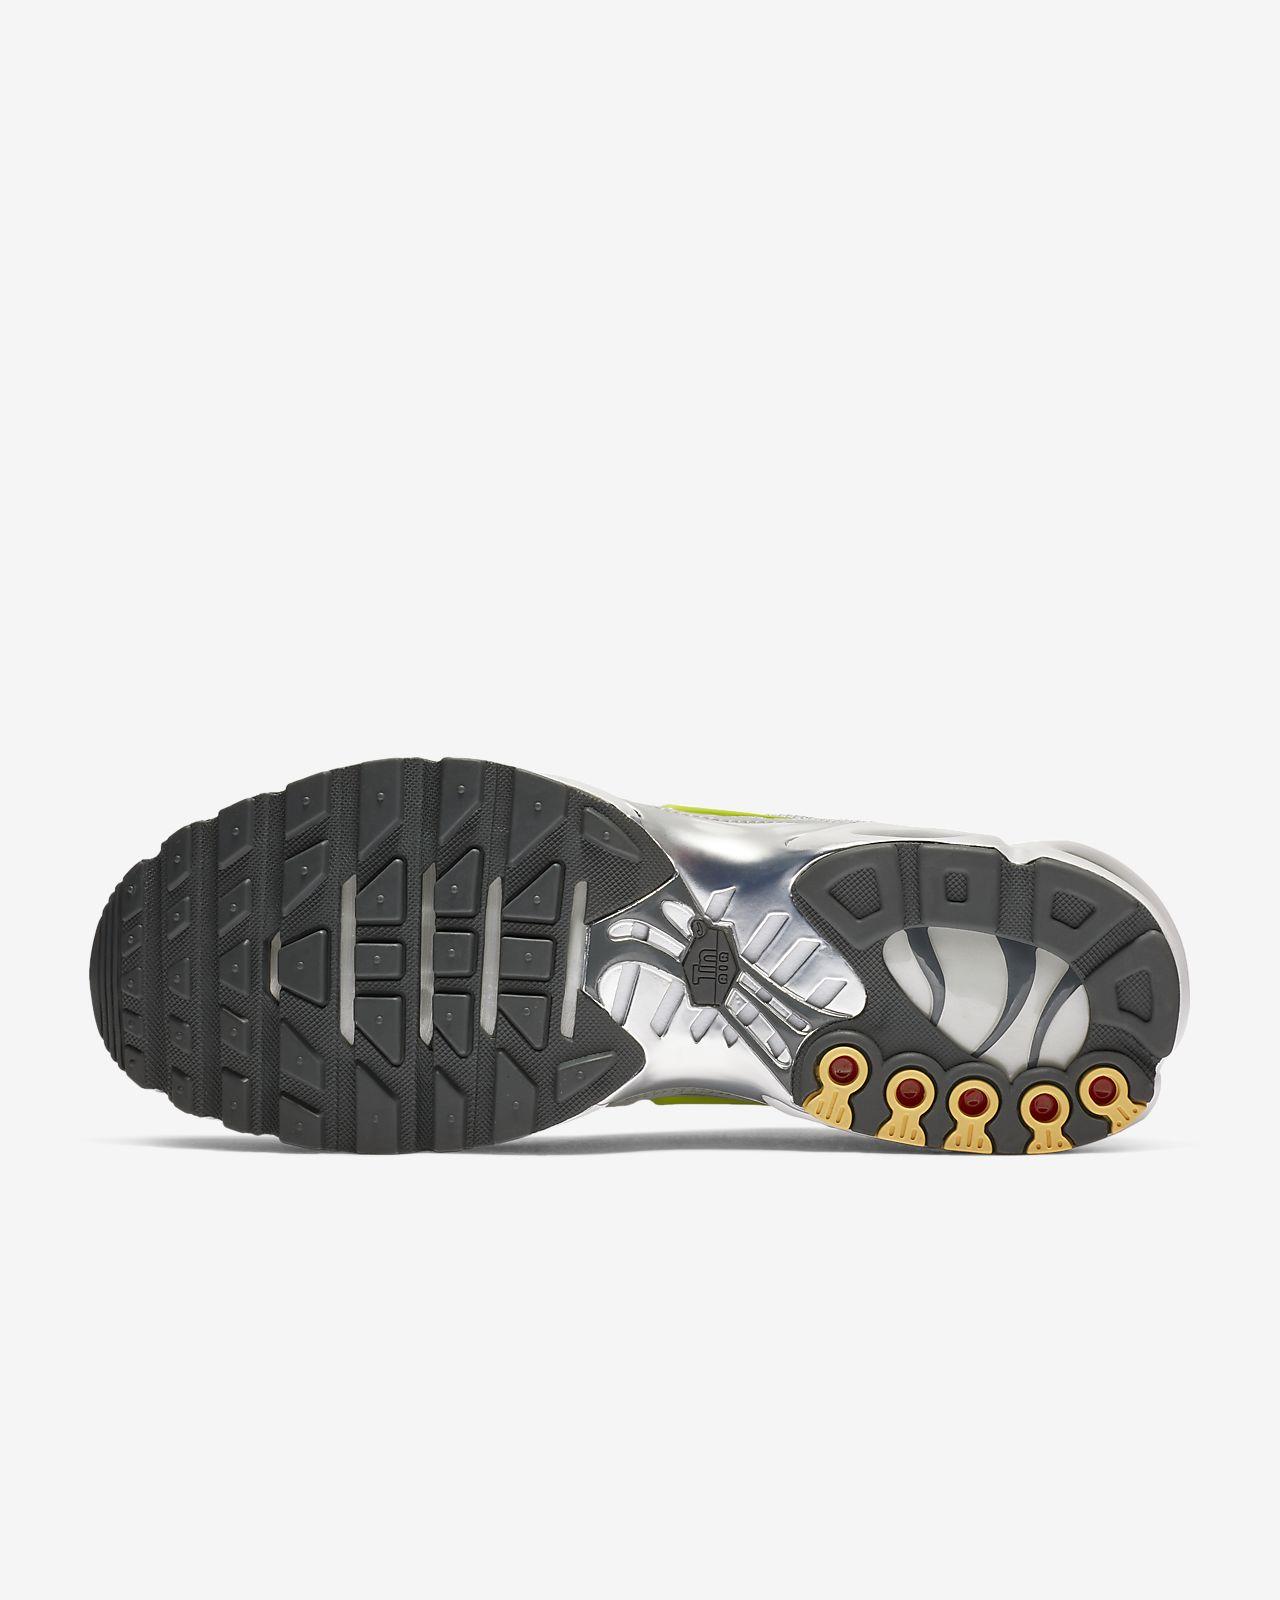 92c39e1ac8 Nike Air Max Plus TN SE Men's Shoe. Nike.com LU